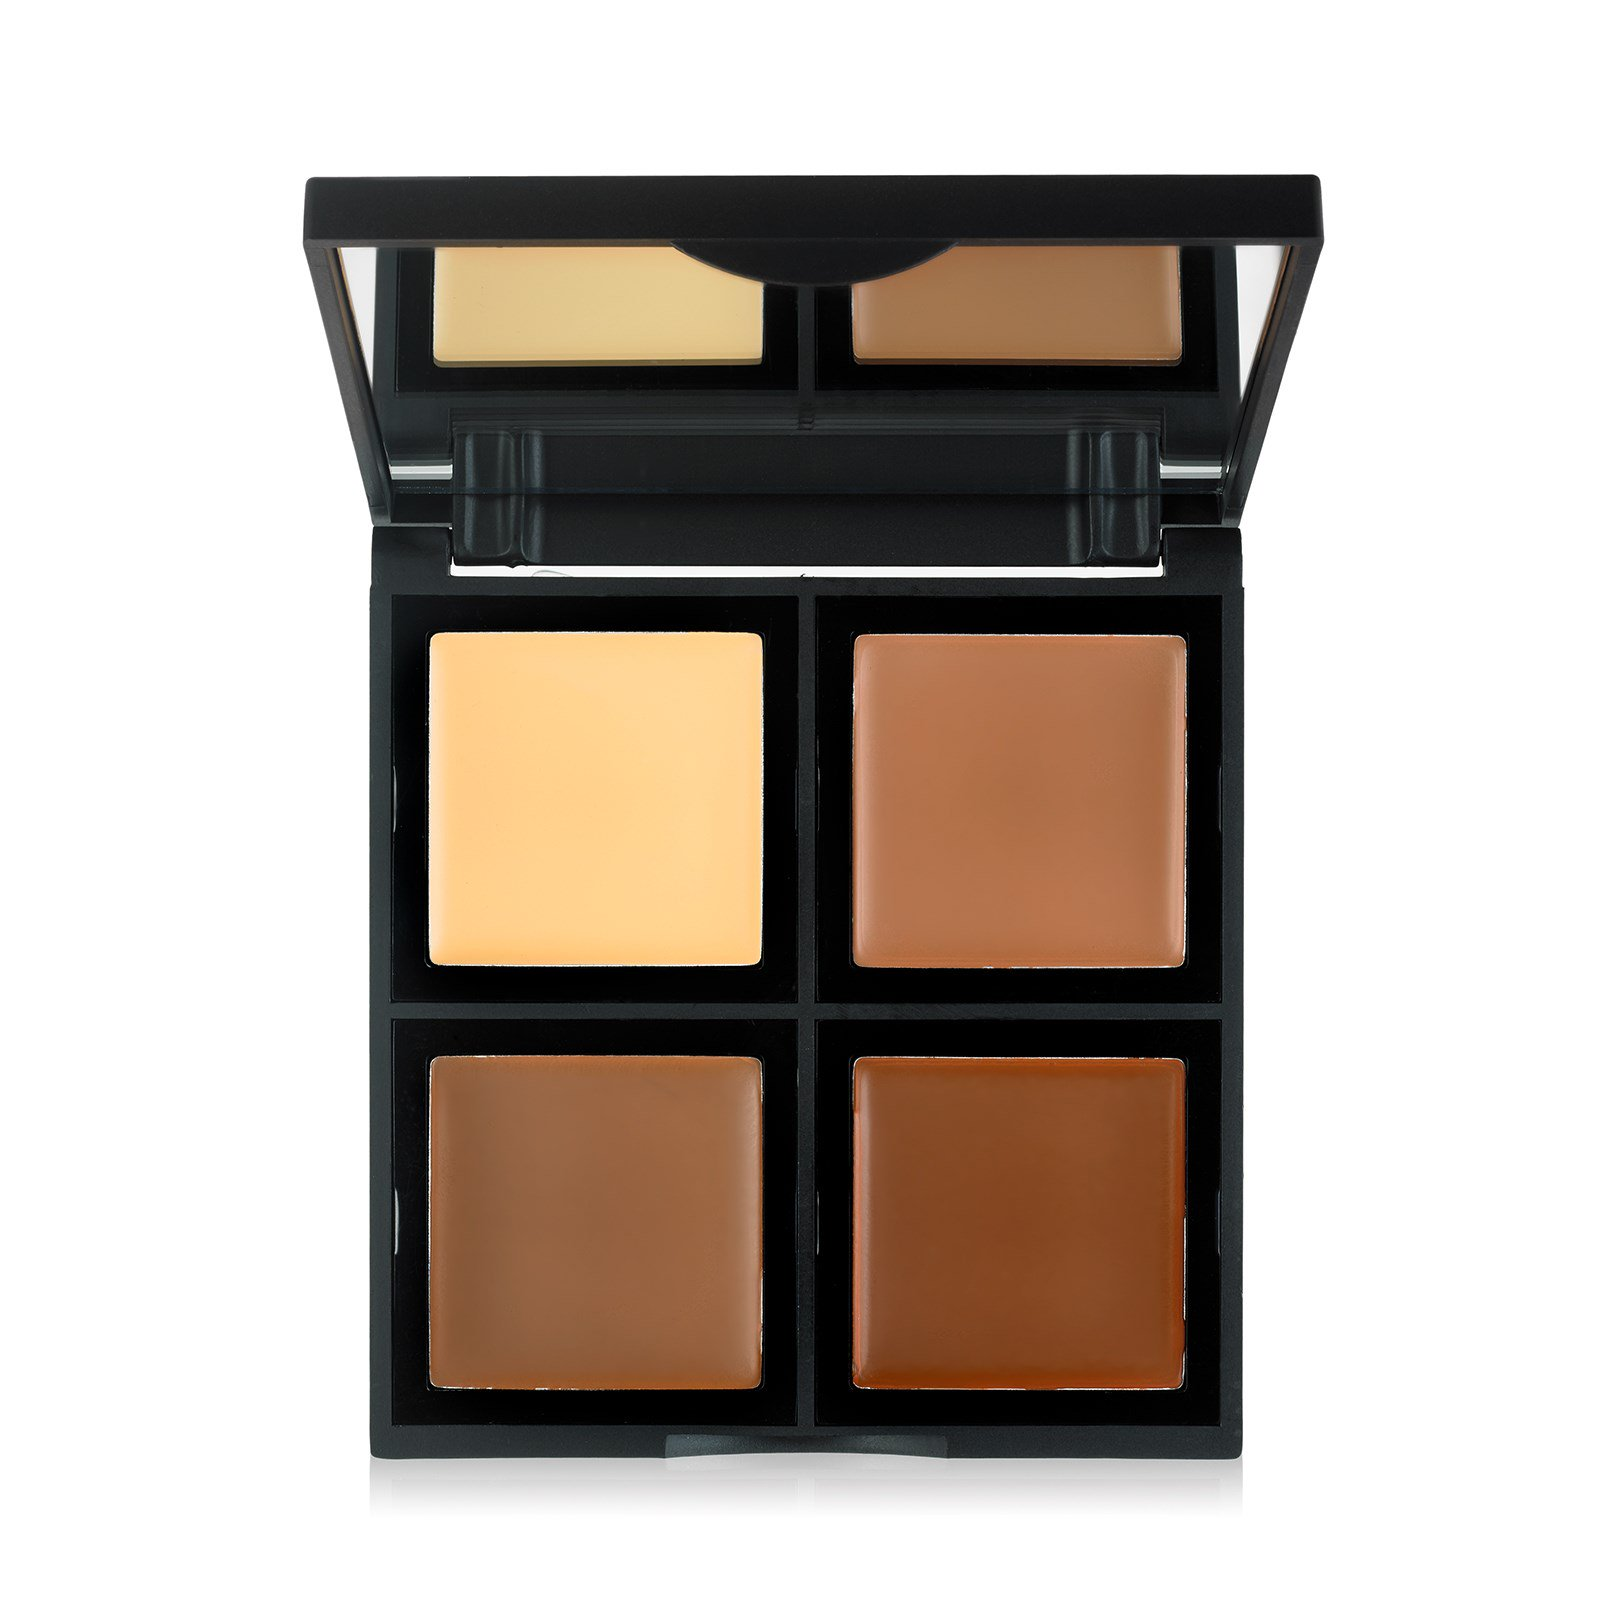 E.L.F. Cosmetics, Cream Contour Palette, 4 Shades, 0.43 oz(pack of 2)